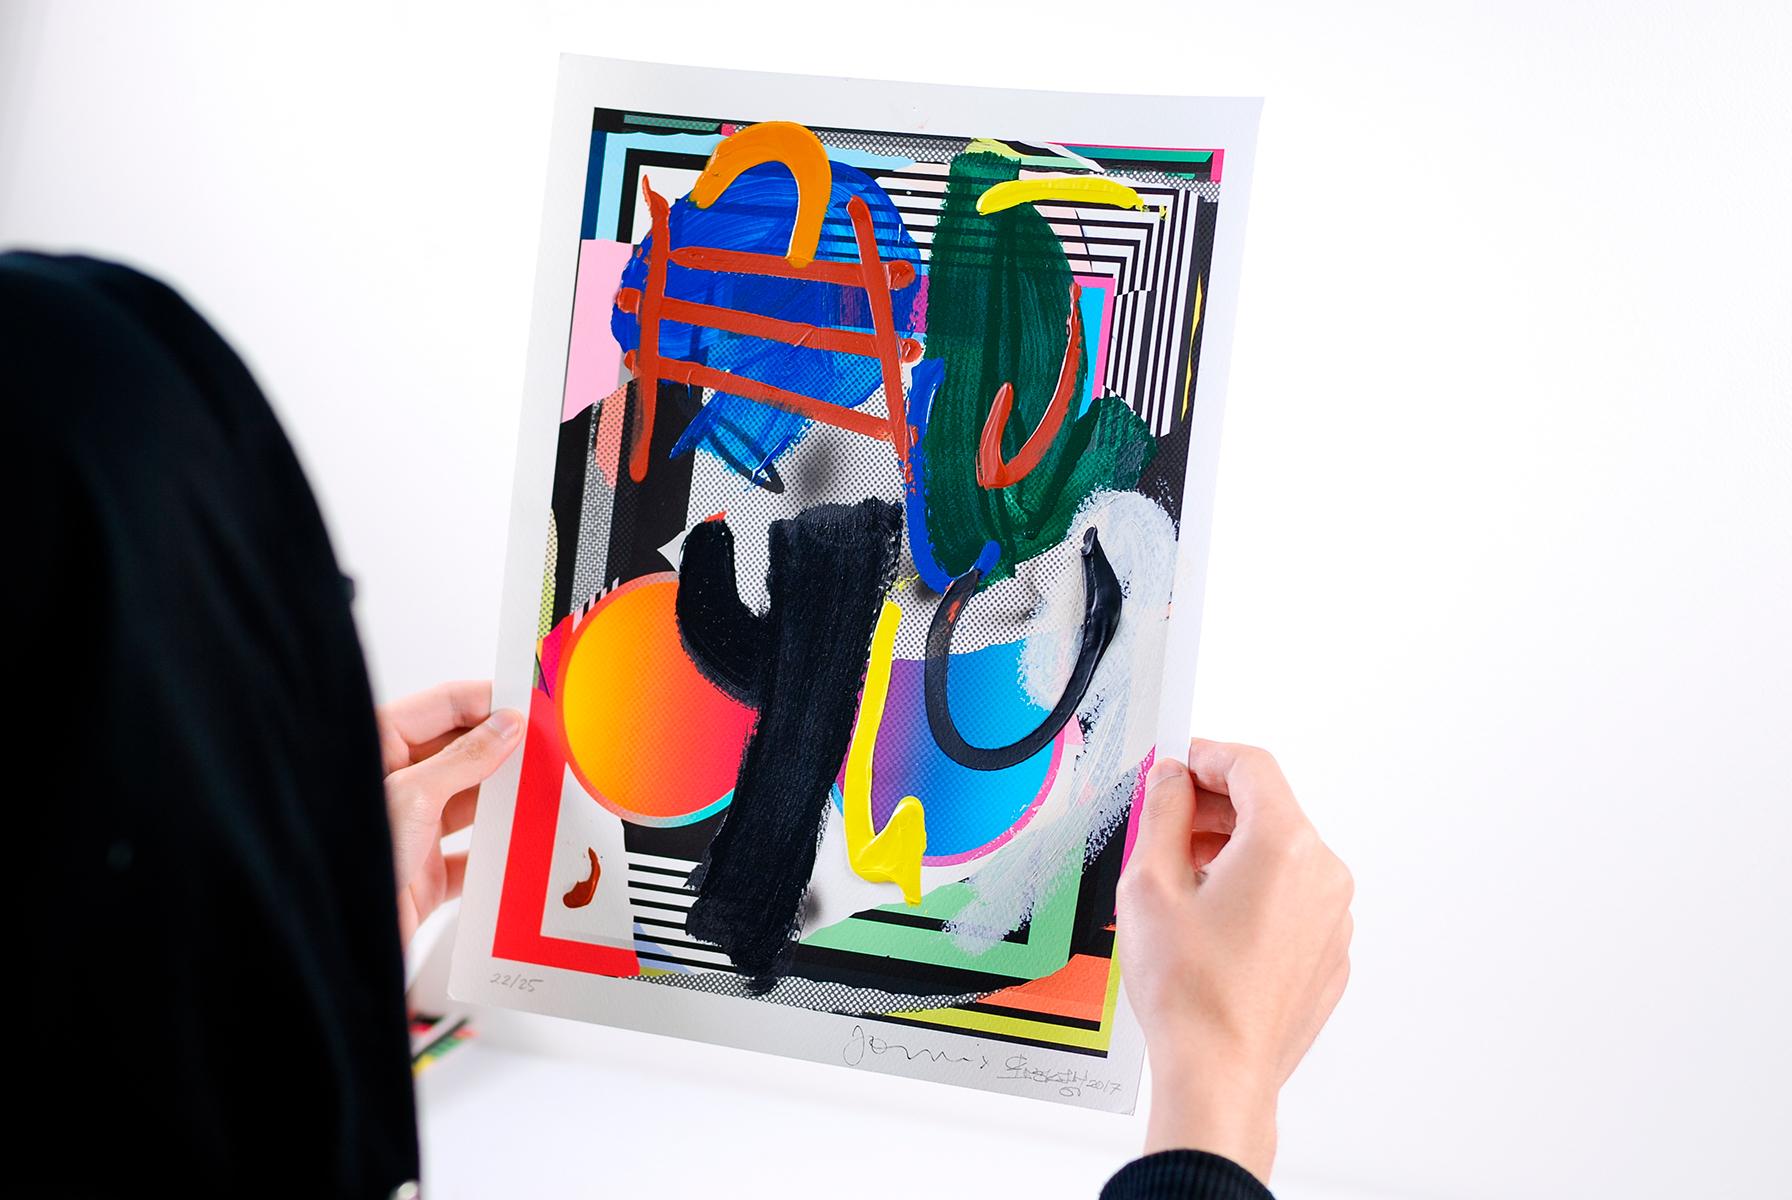 Acrylic, enamel, oil stick, pencil on giclee print. 2018